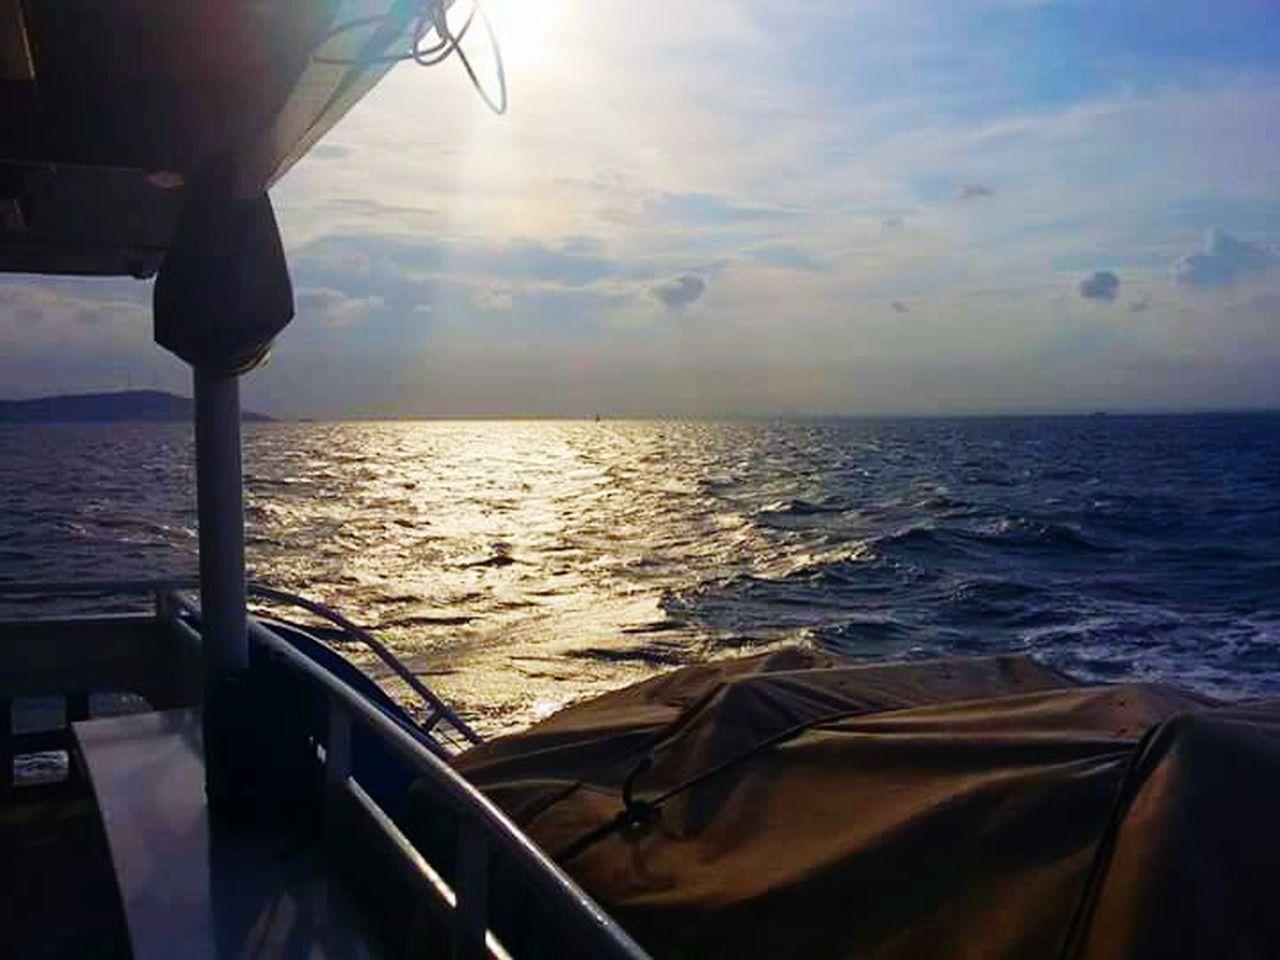 Turkiye Marmara sea Istanbul Sealife Summer Views Sunset Samsungphones S Mini Boat